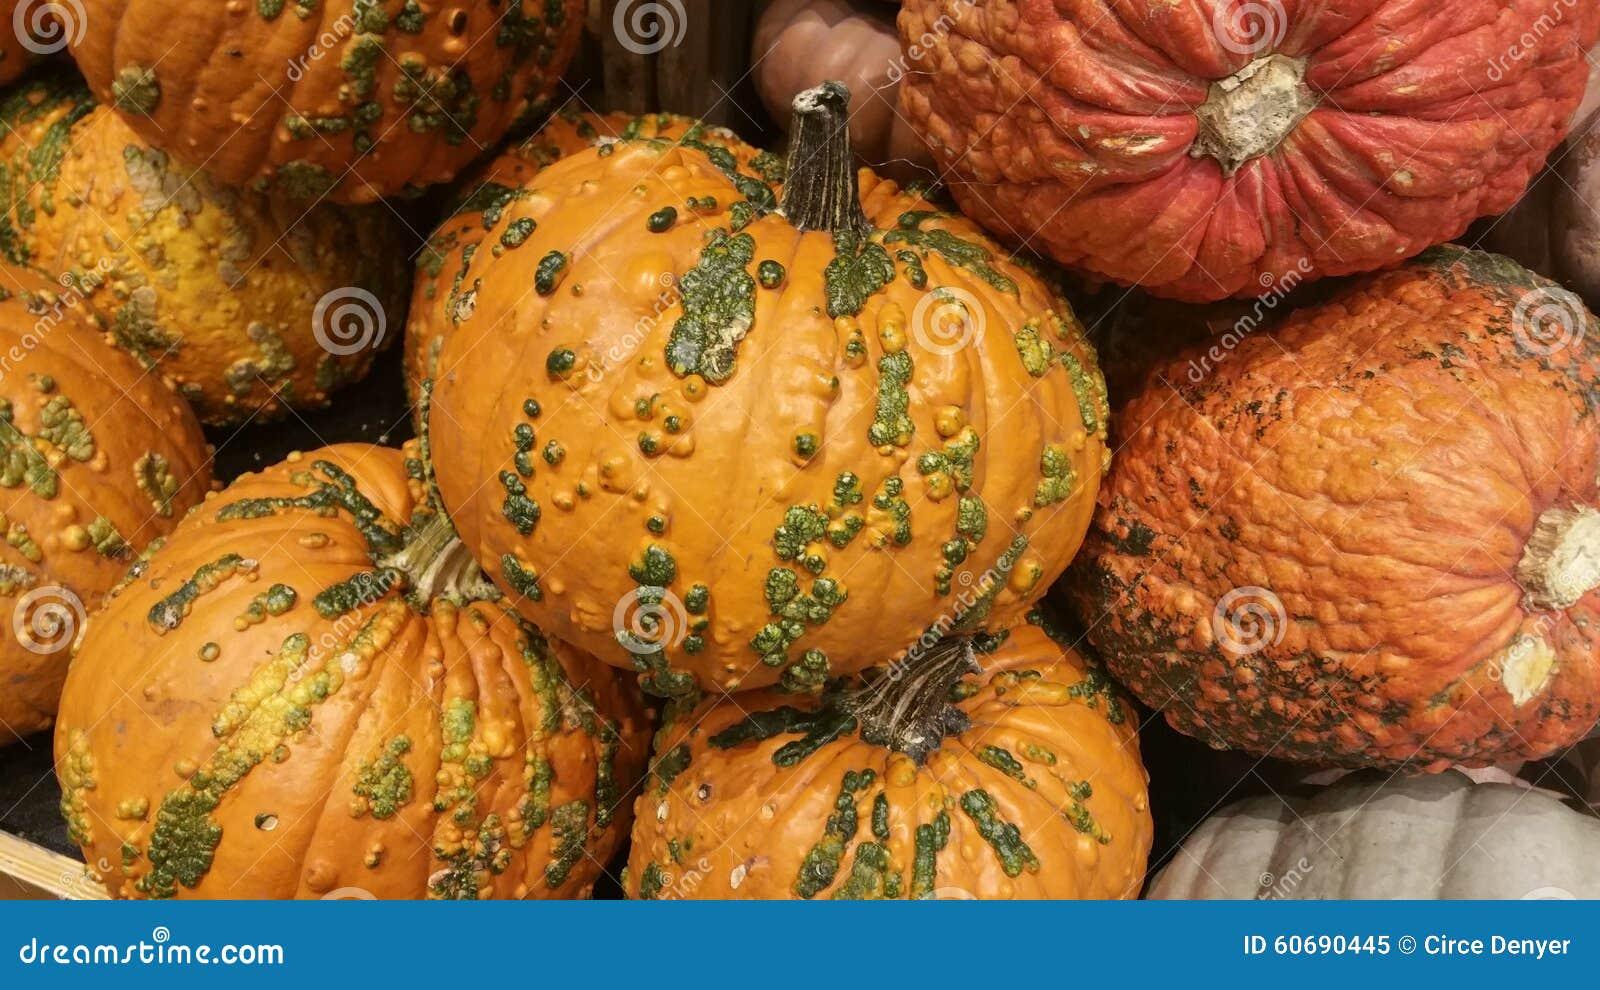 gourd like pumpkins stock image image of textured green 60690445 rh dreamstime com